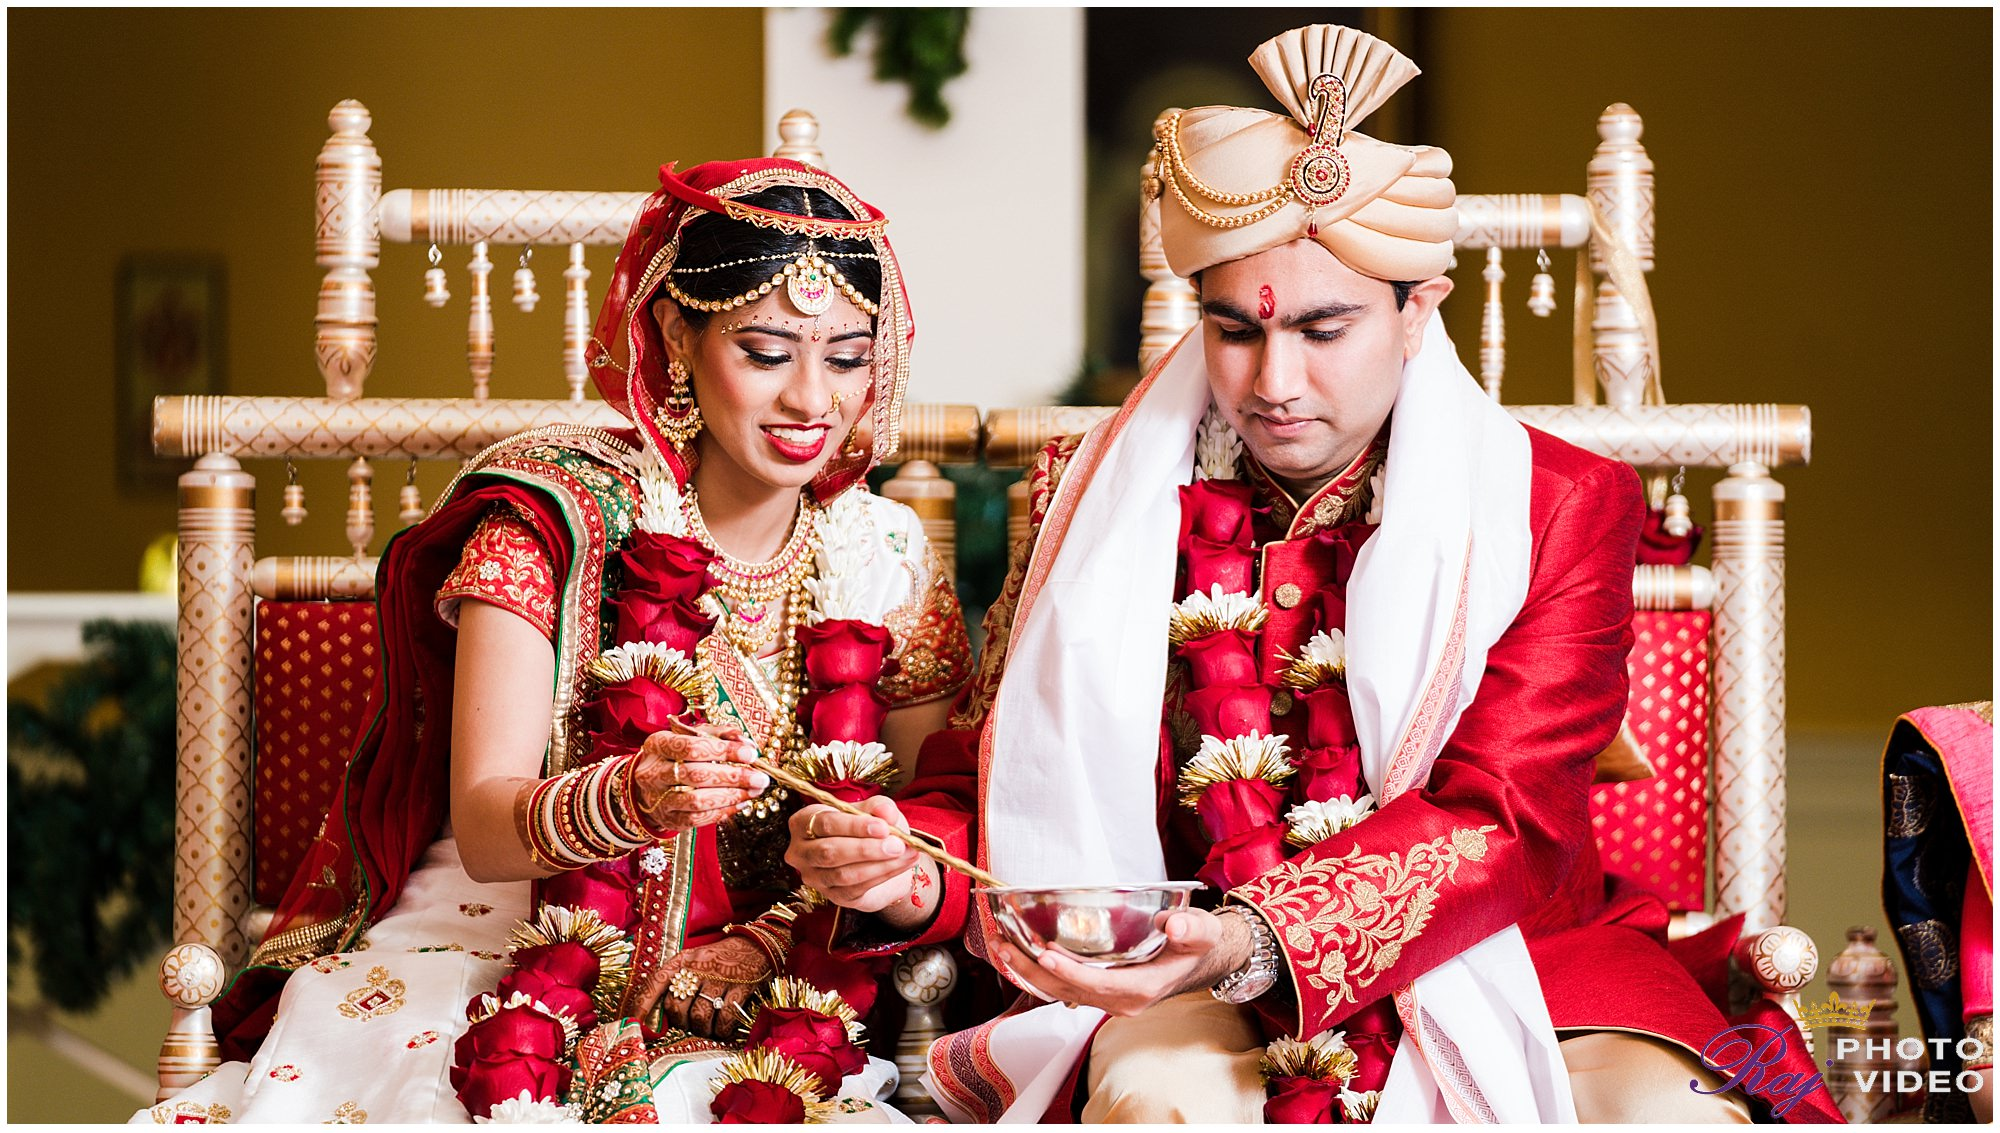 Founders-Inn-and-Spa-Virginia-Beach-VA-Indian-Wedding-Harini-Vivek-55.jpg